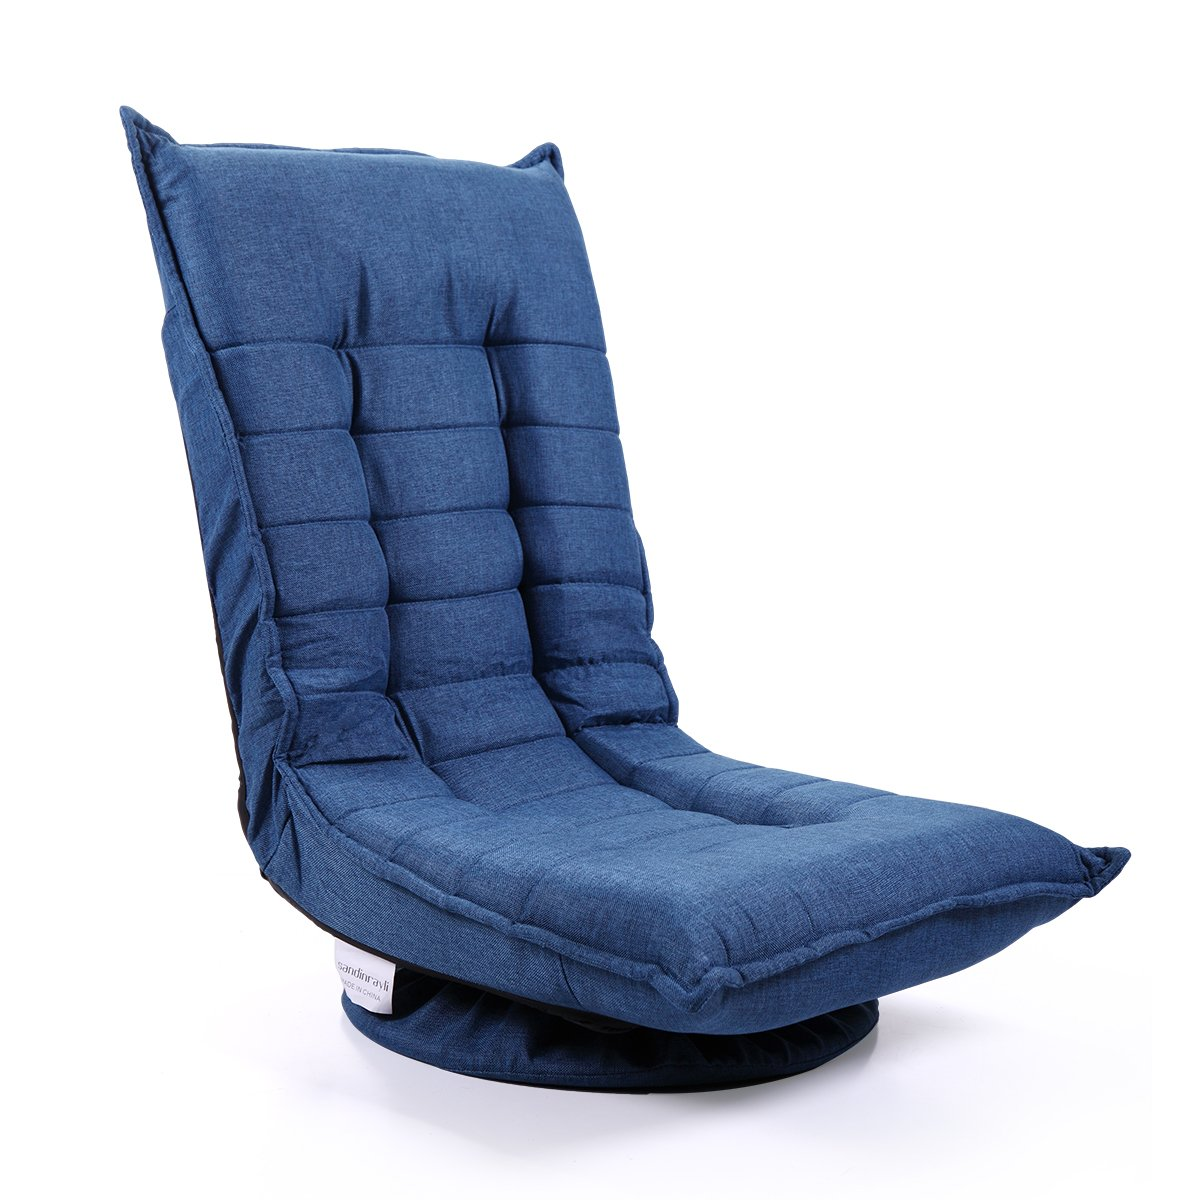 Tobbi Fabric Folded Floor Chair 360 Rotation Swivel Video Rocker Gaming Sofa Chair Adjustable Angle Chair Blue